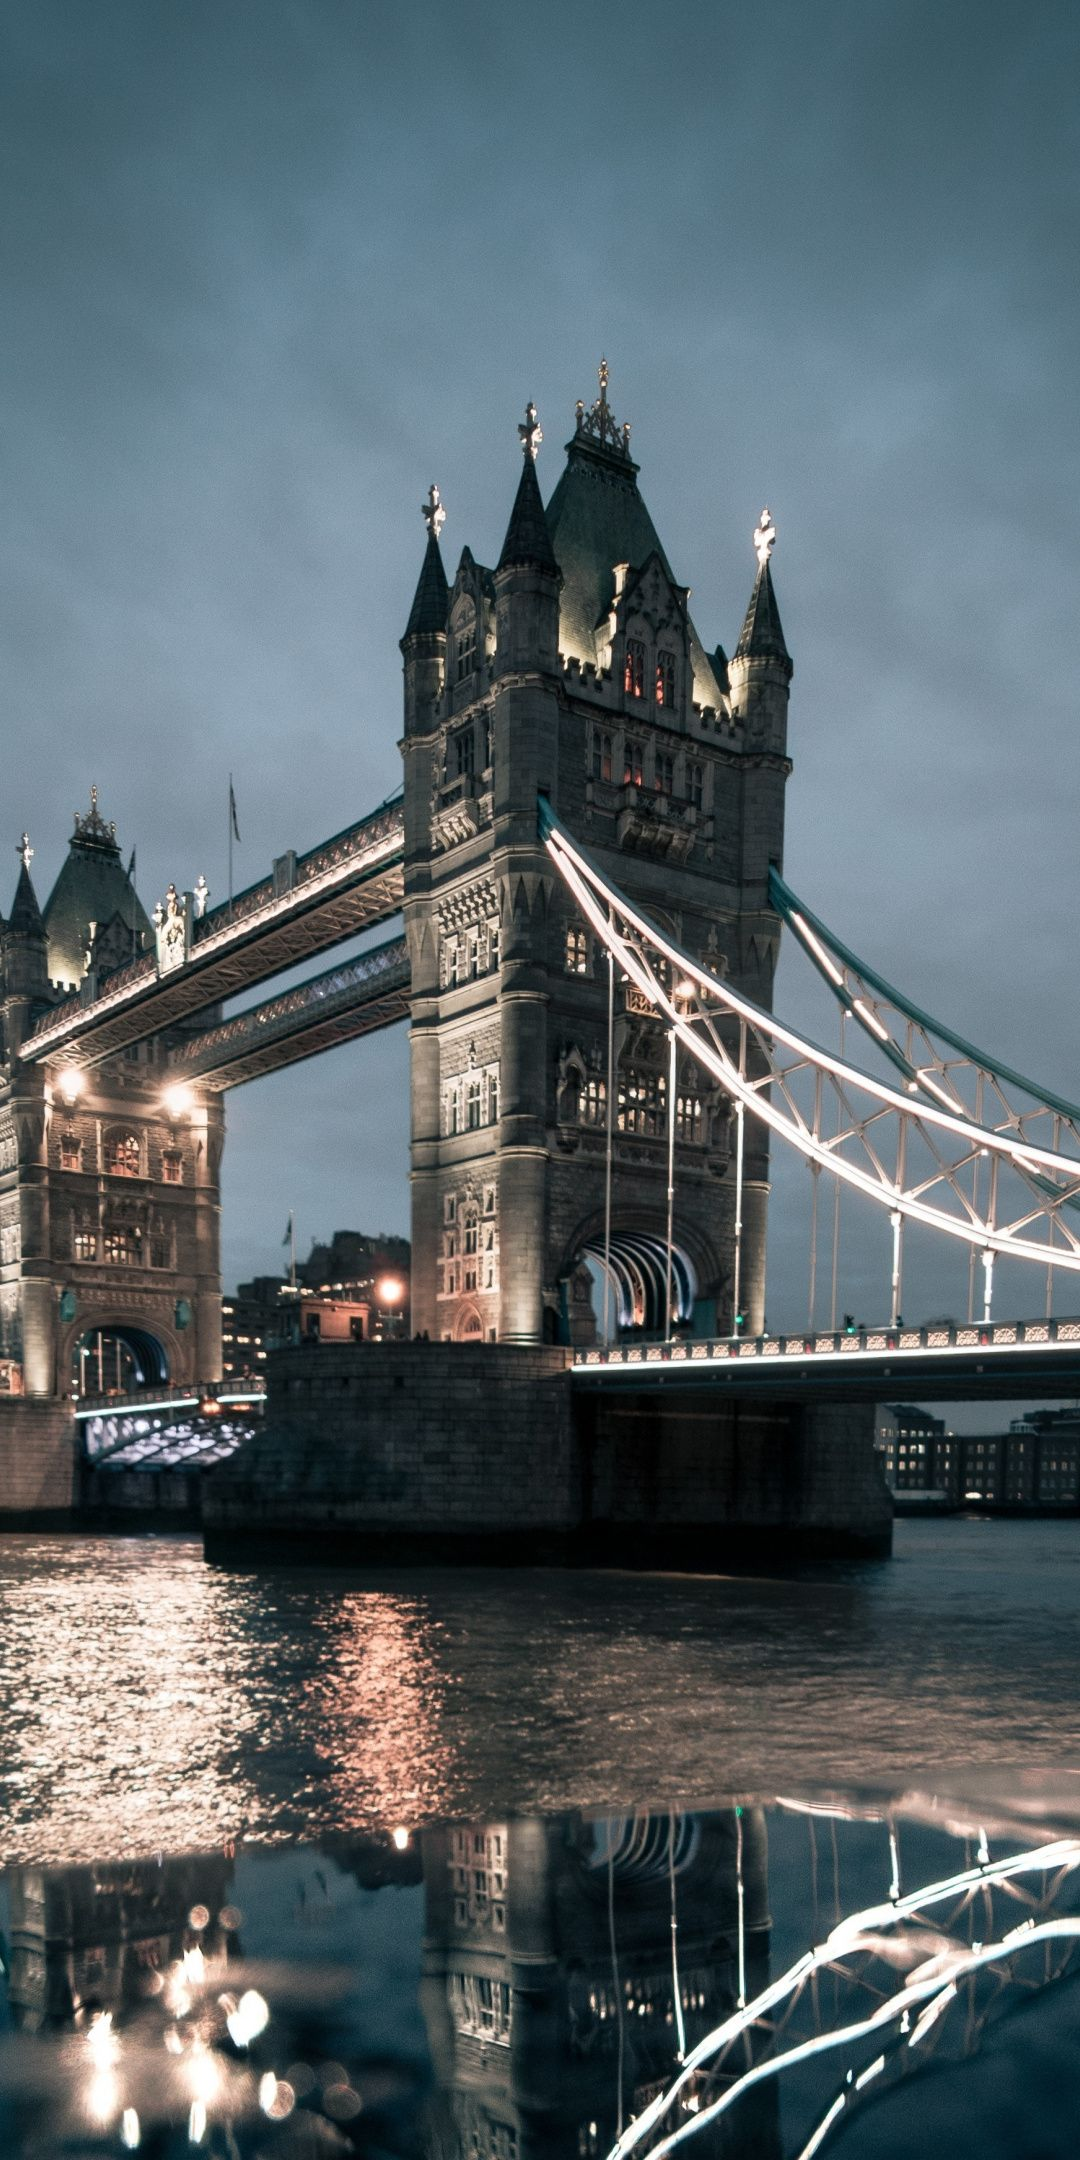 London Tower Bridge Night City 1080x2160 Wallpaper London Wallpaper Bridge Wallpaper London Dreams Aesthetic wallpaper city london